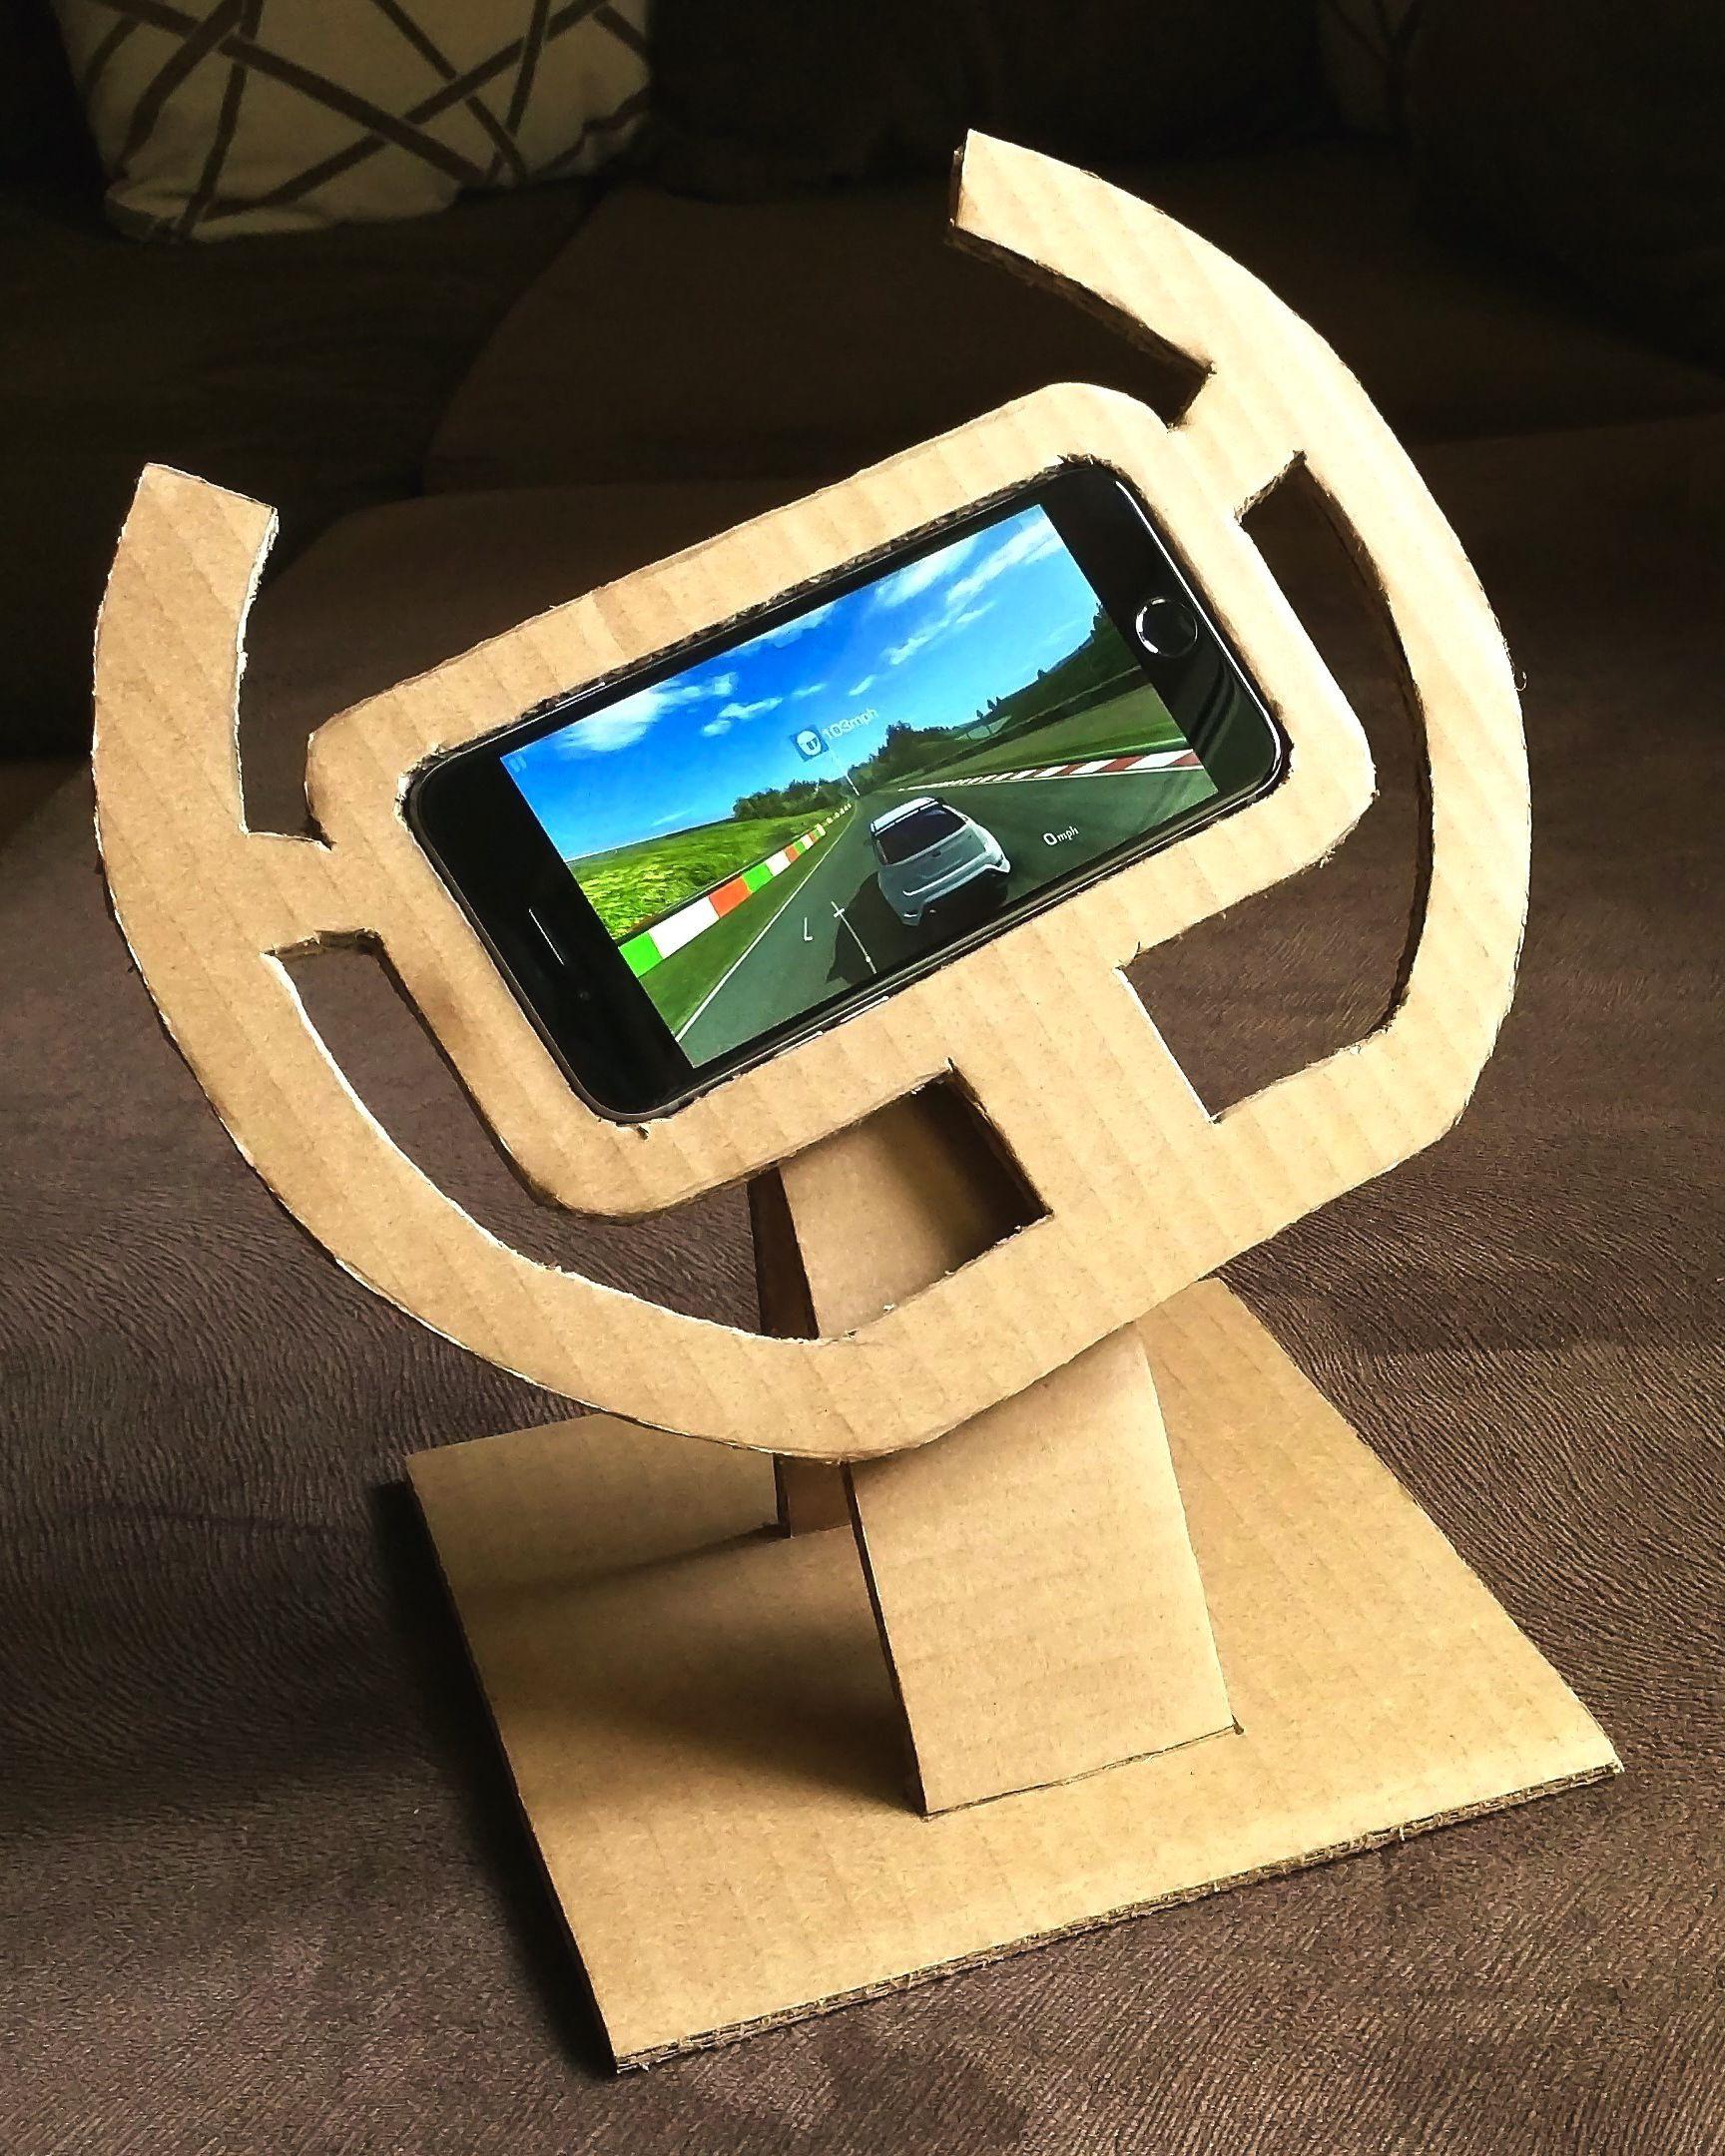 How to make cardboard gaming wheel diy handmade